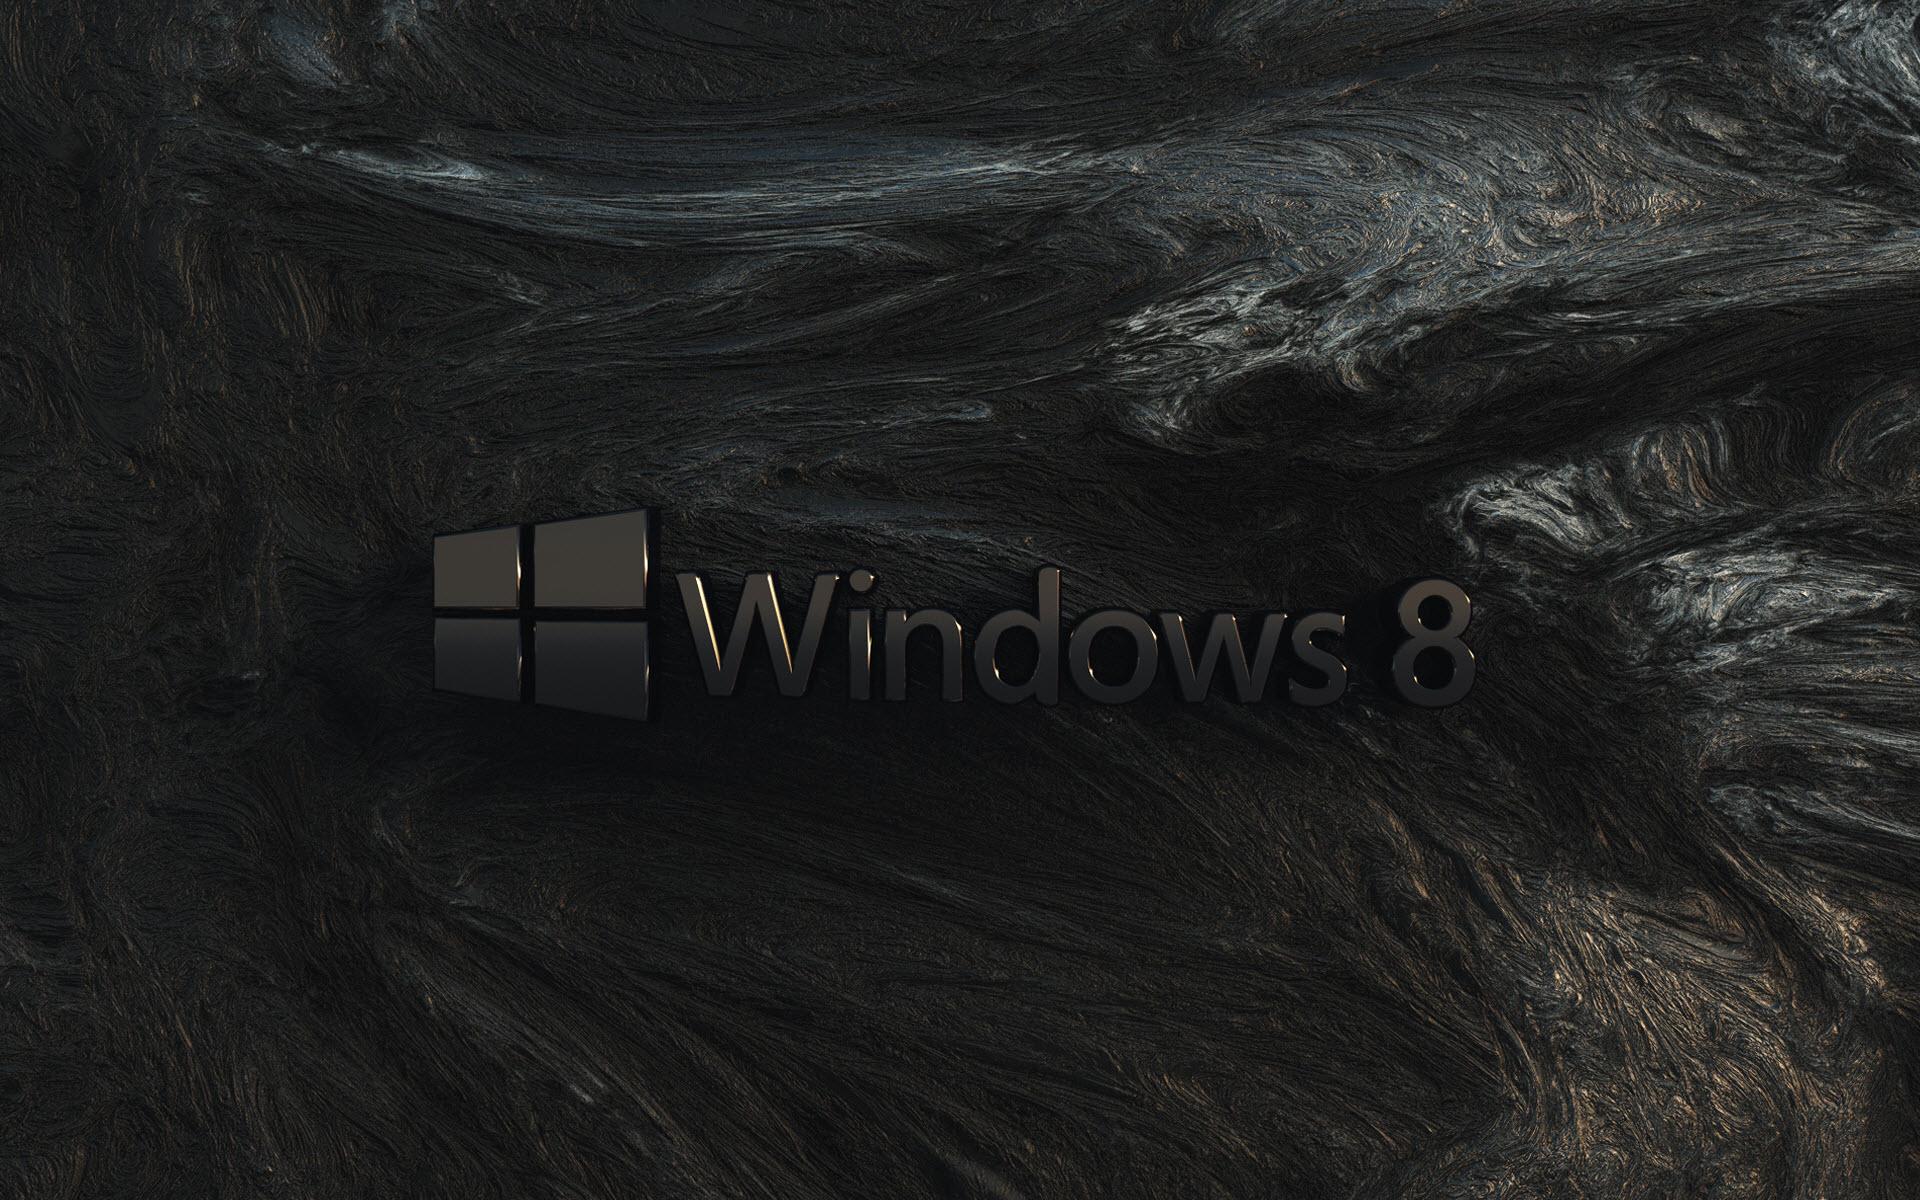 Download Windows 8 Dark HD Wallpapers Full Size 1920x1200